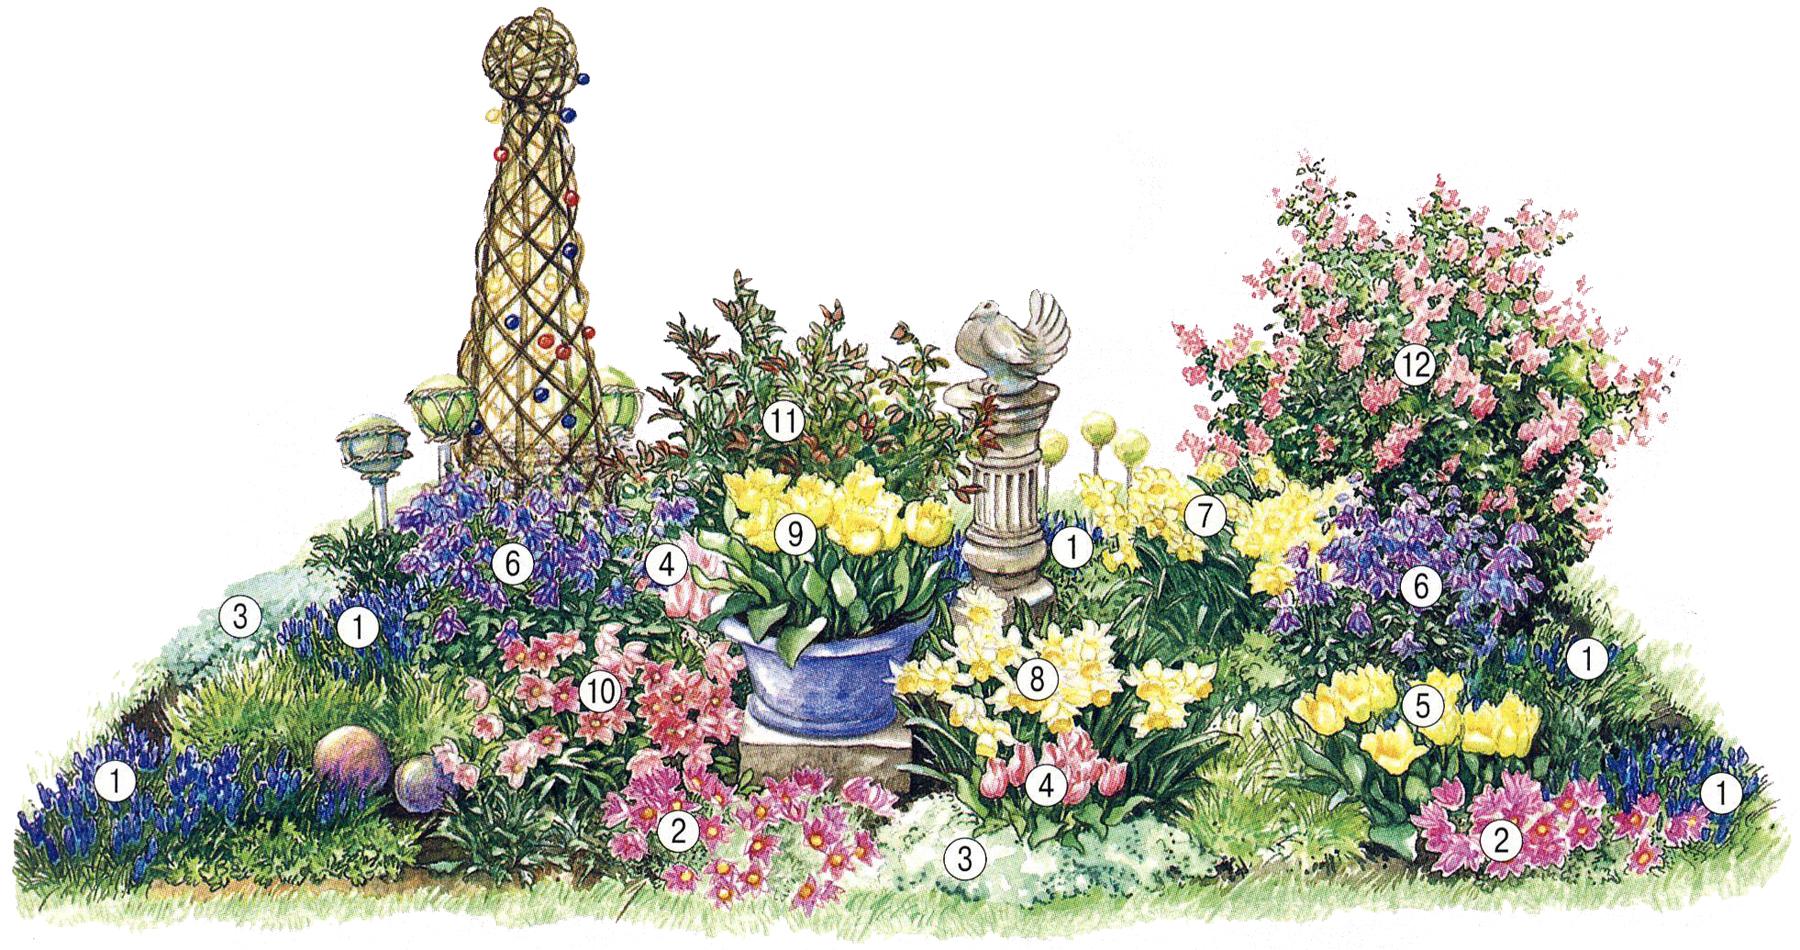 Непрерывно цветущая клумба - весна